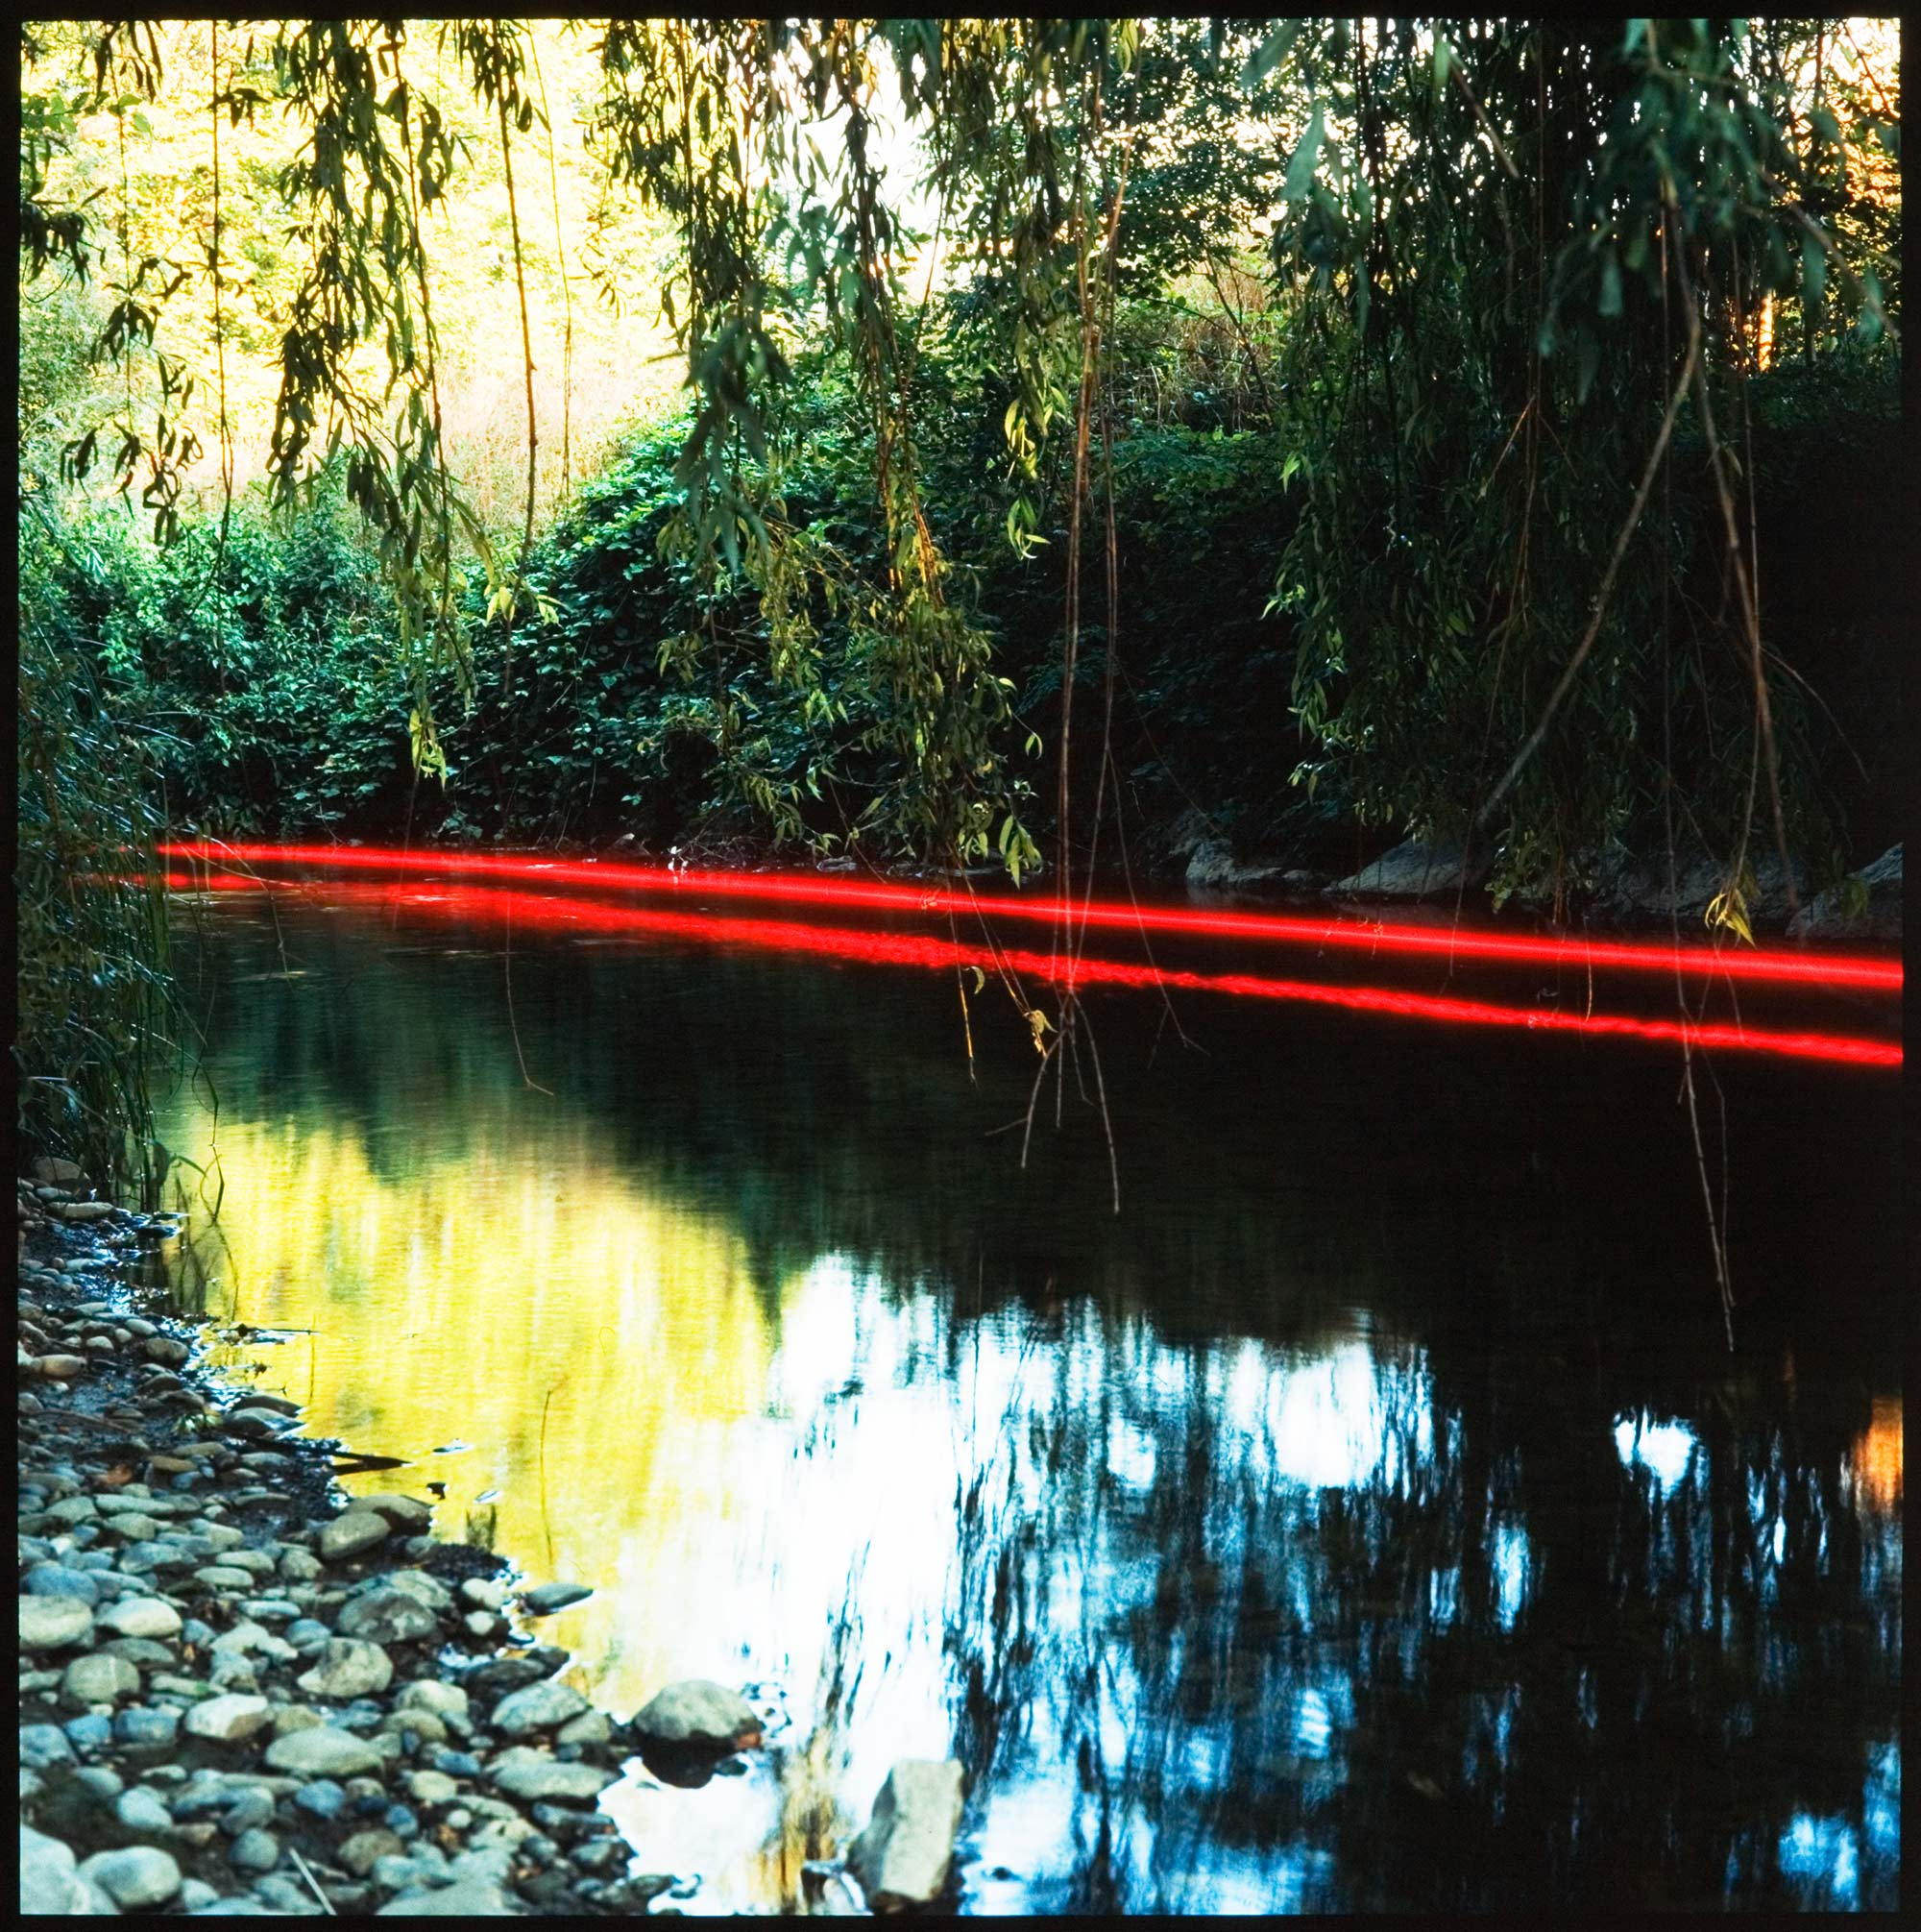 # 11 Graffiti rouges, 1984